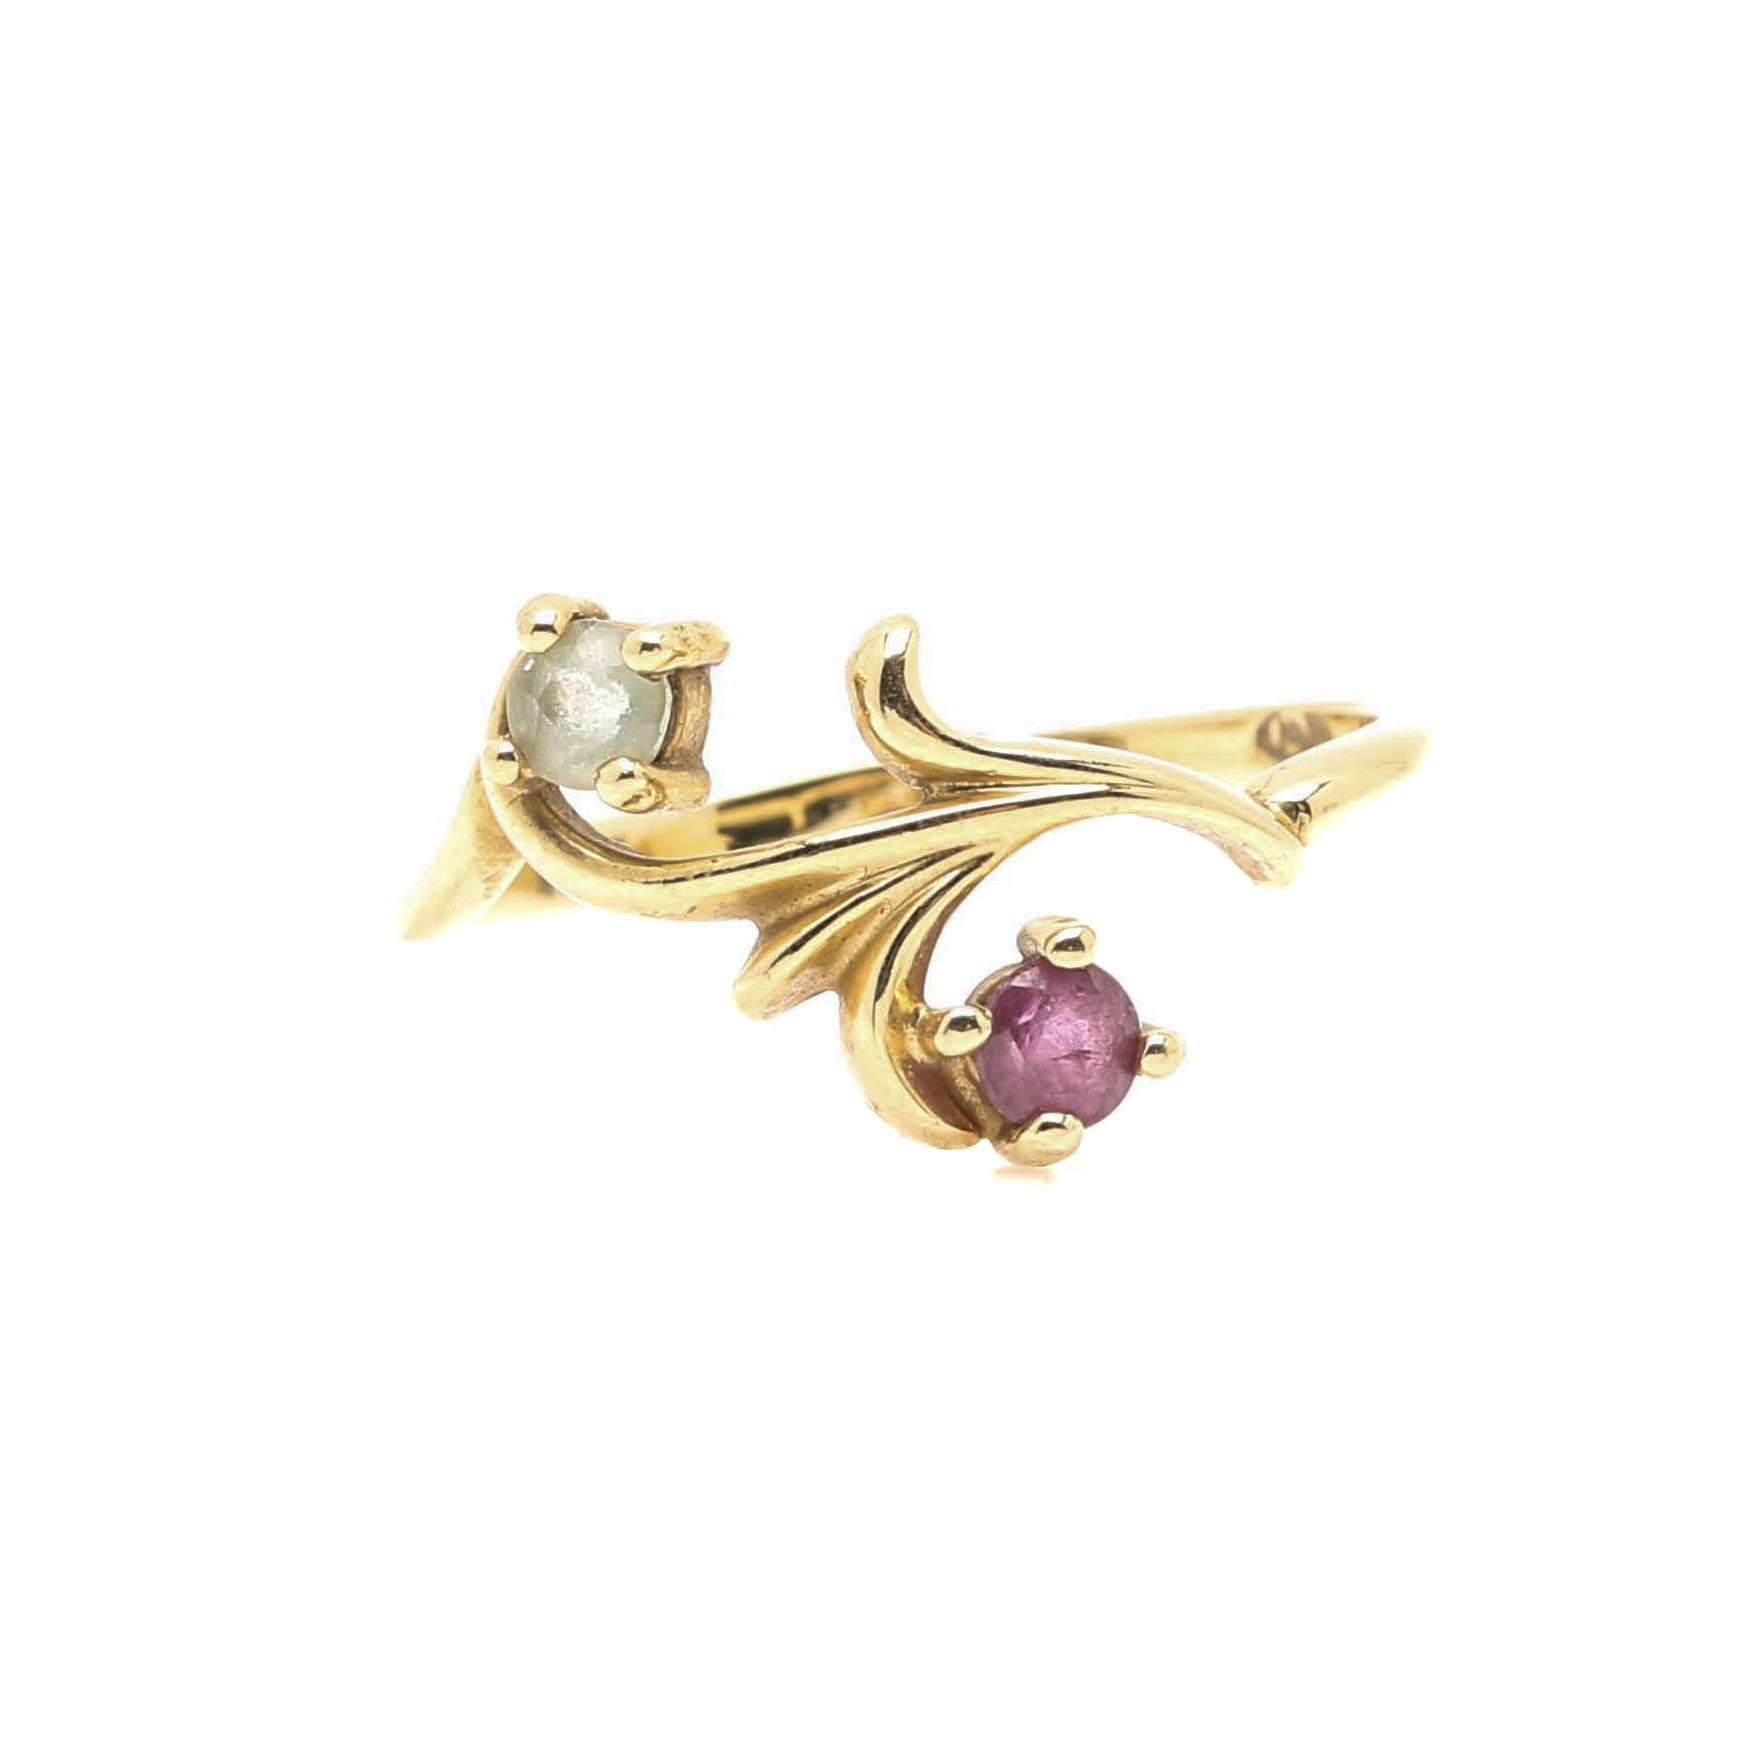 14K Yellow Gold Ruby and Aquamarine Ring